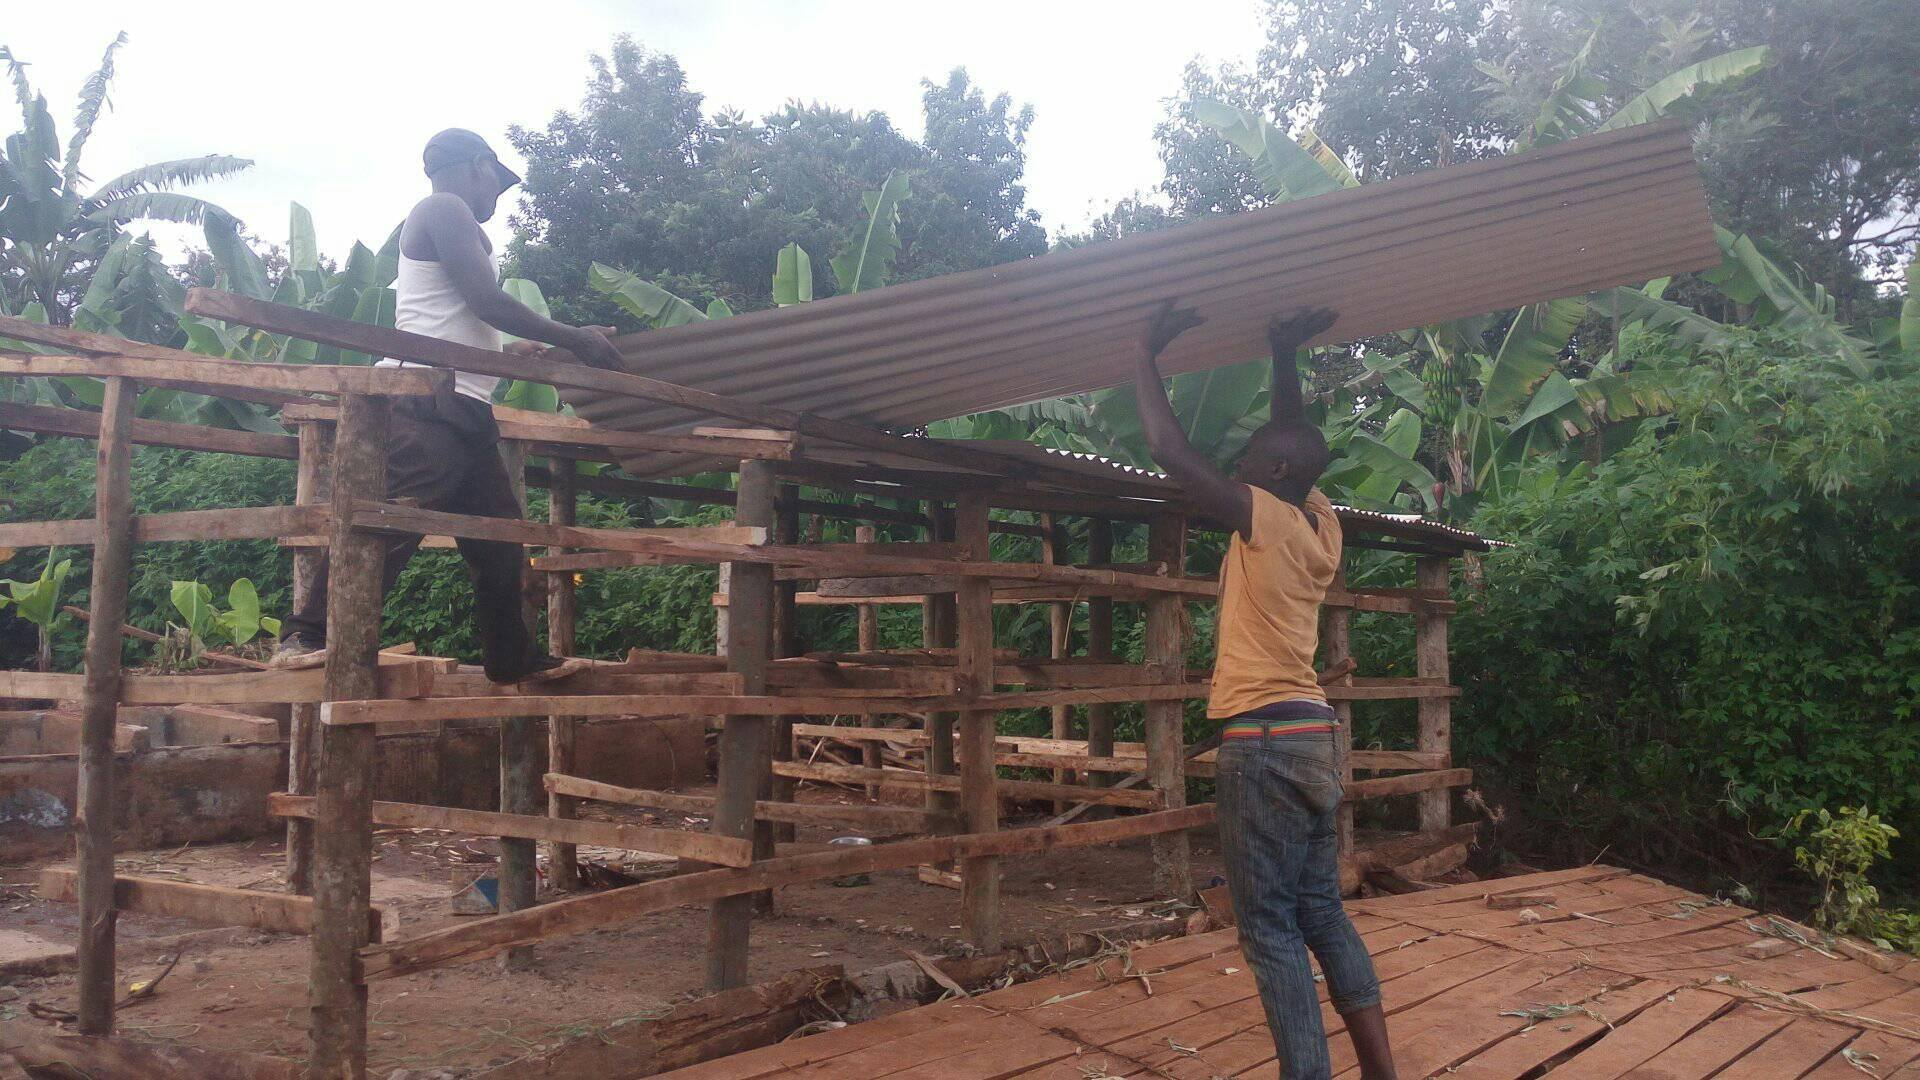 We built the shed back stronger.